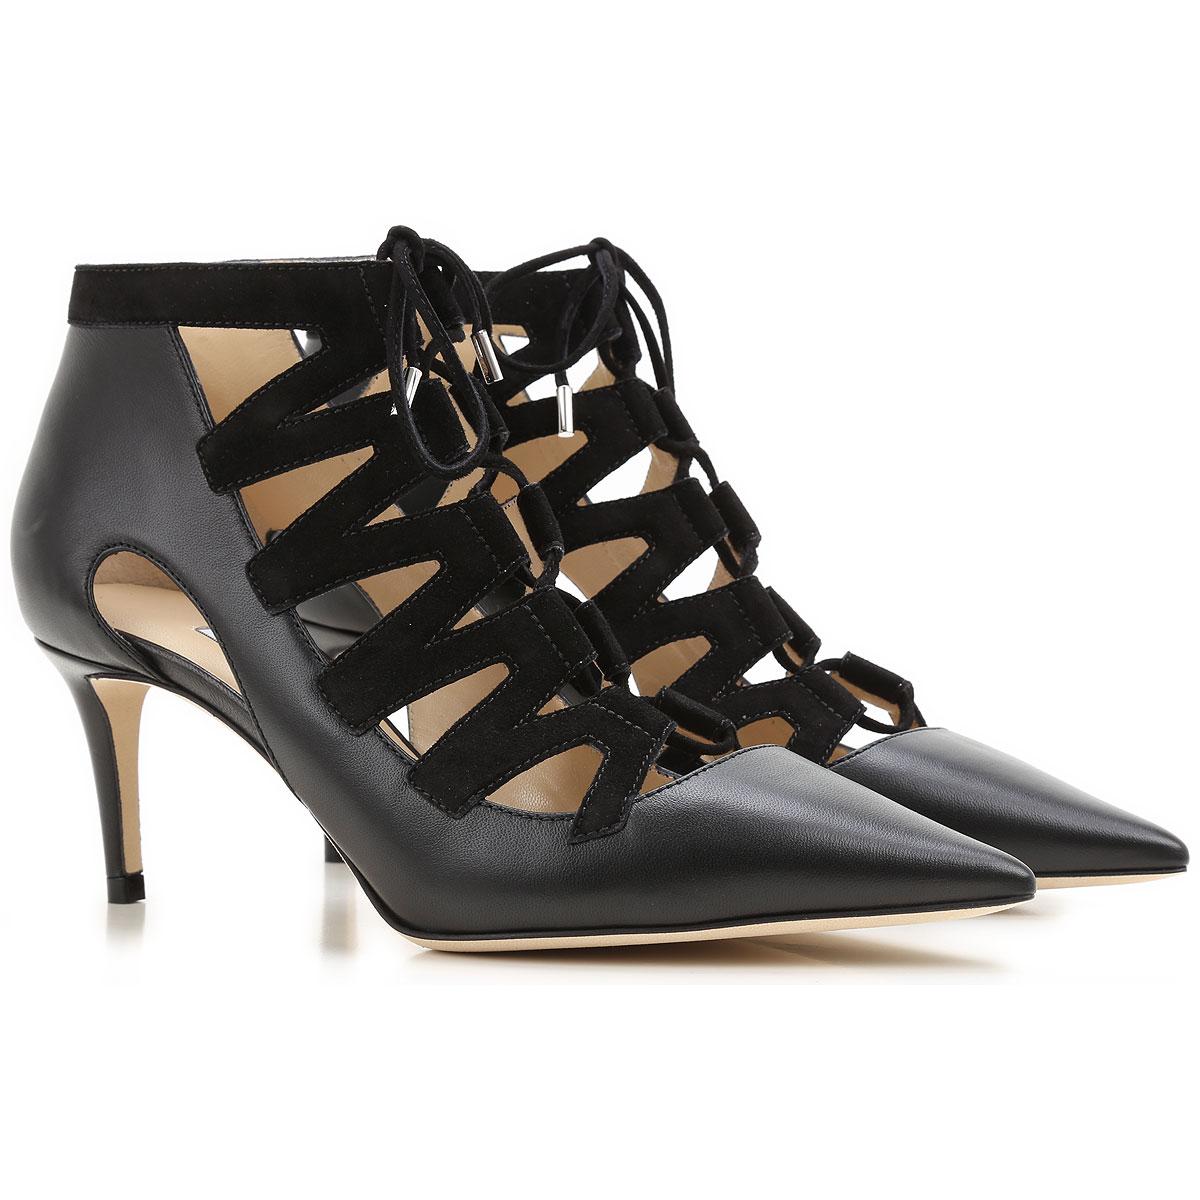 chaussures femme jimmy choo code produit dixon nsu. Black Bedroom Furniture Sets. Home Design Ideas